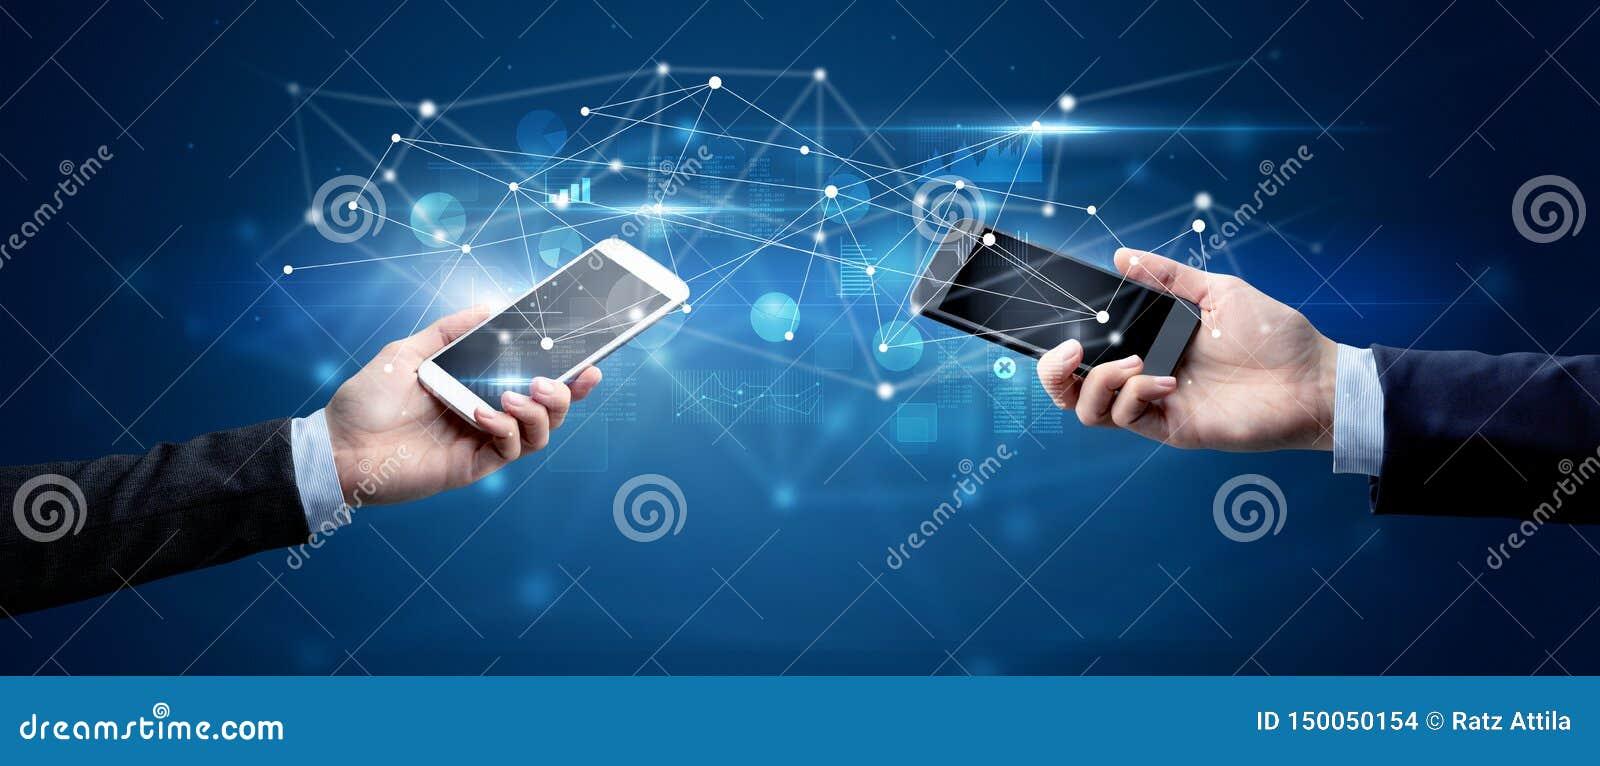 Smartphones sharing business data